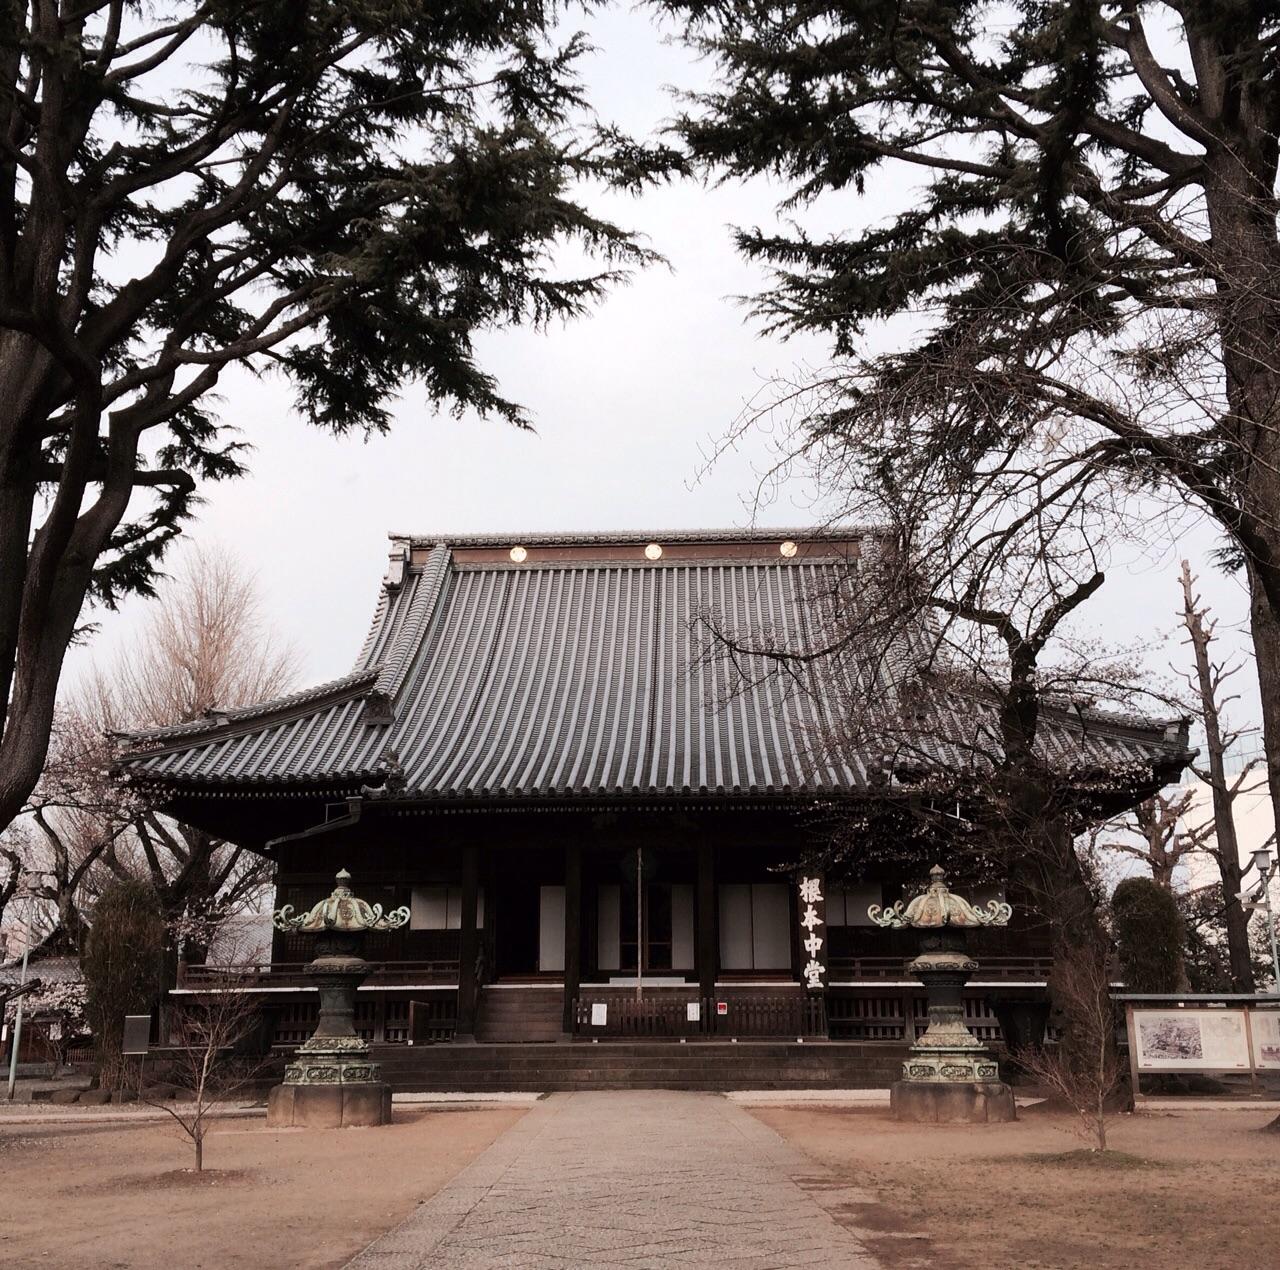 A shrine to something